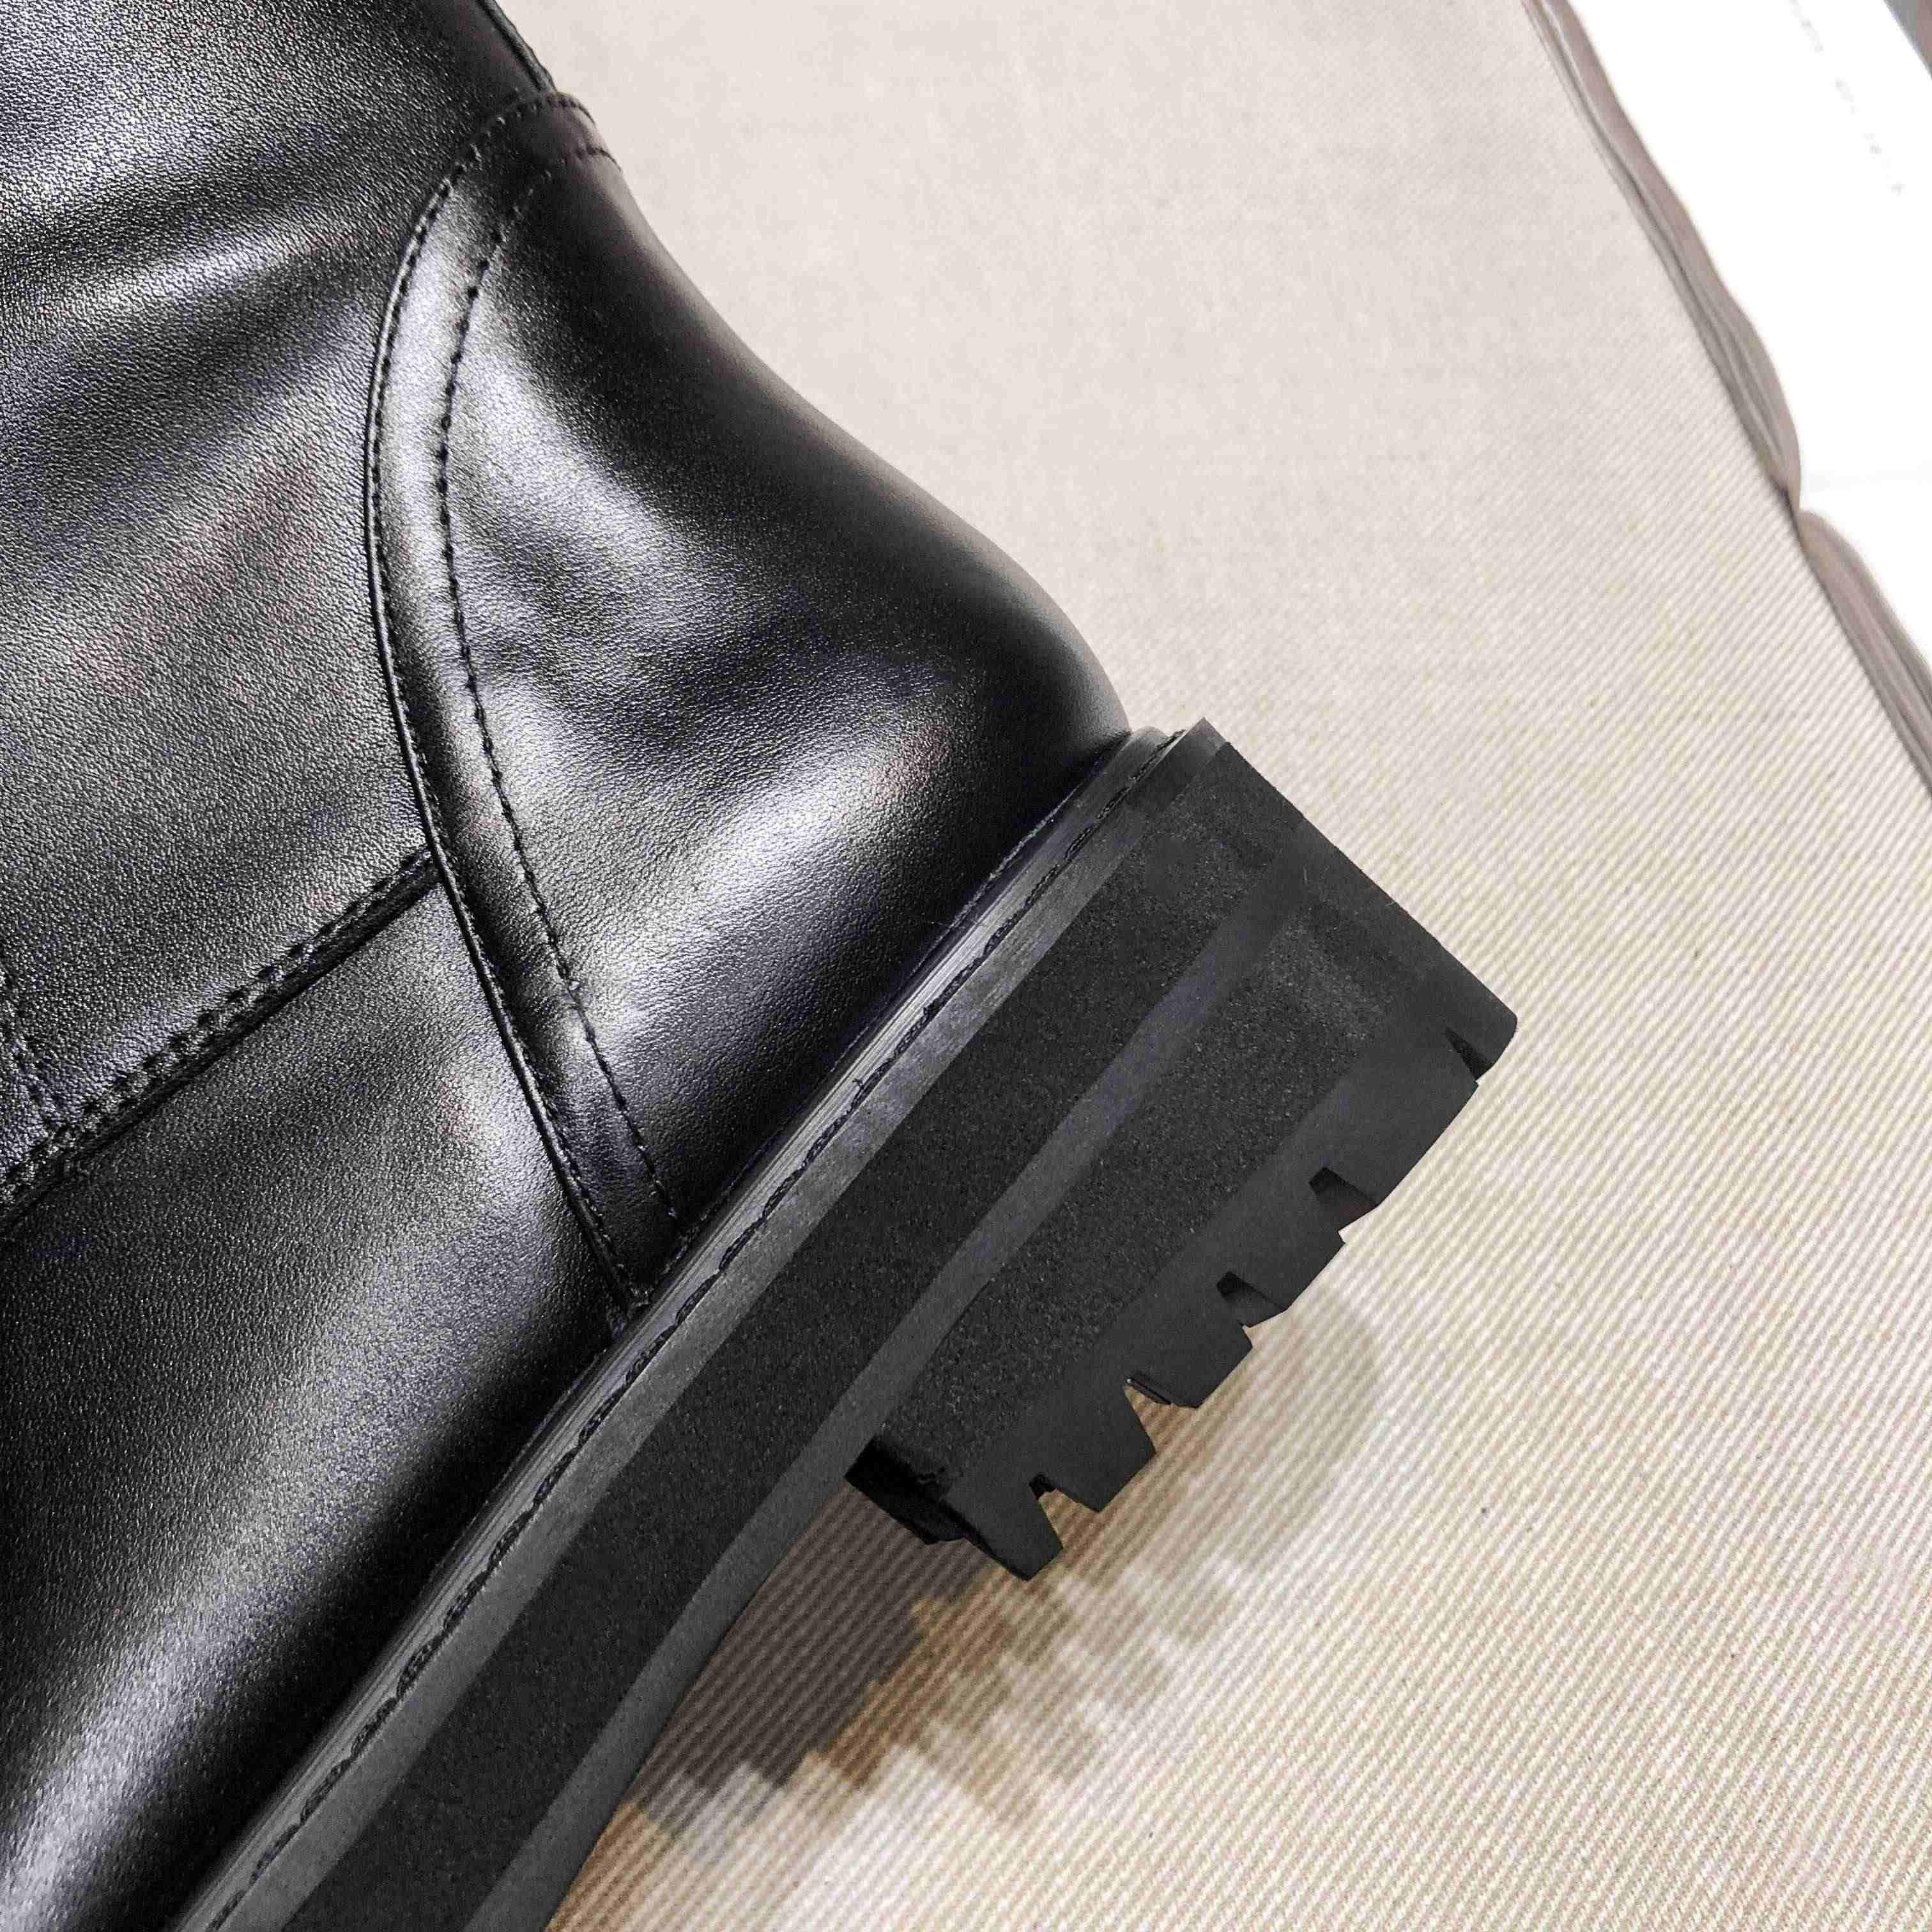 Krazing หม้อของแท้หนัง lace up med รองเท้าส้นสูงรอบ toe punk superstar ขี่ม้ารองเท้าหัวเข็มขัดรัด over-the- รองเท้าเข่า l35